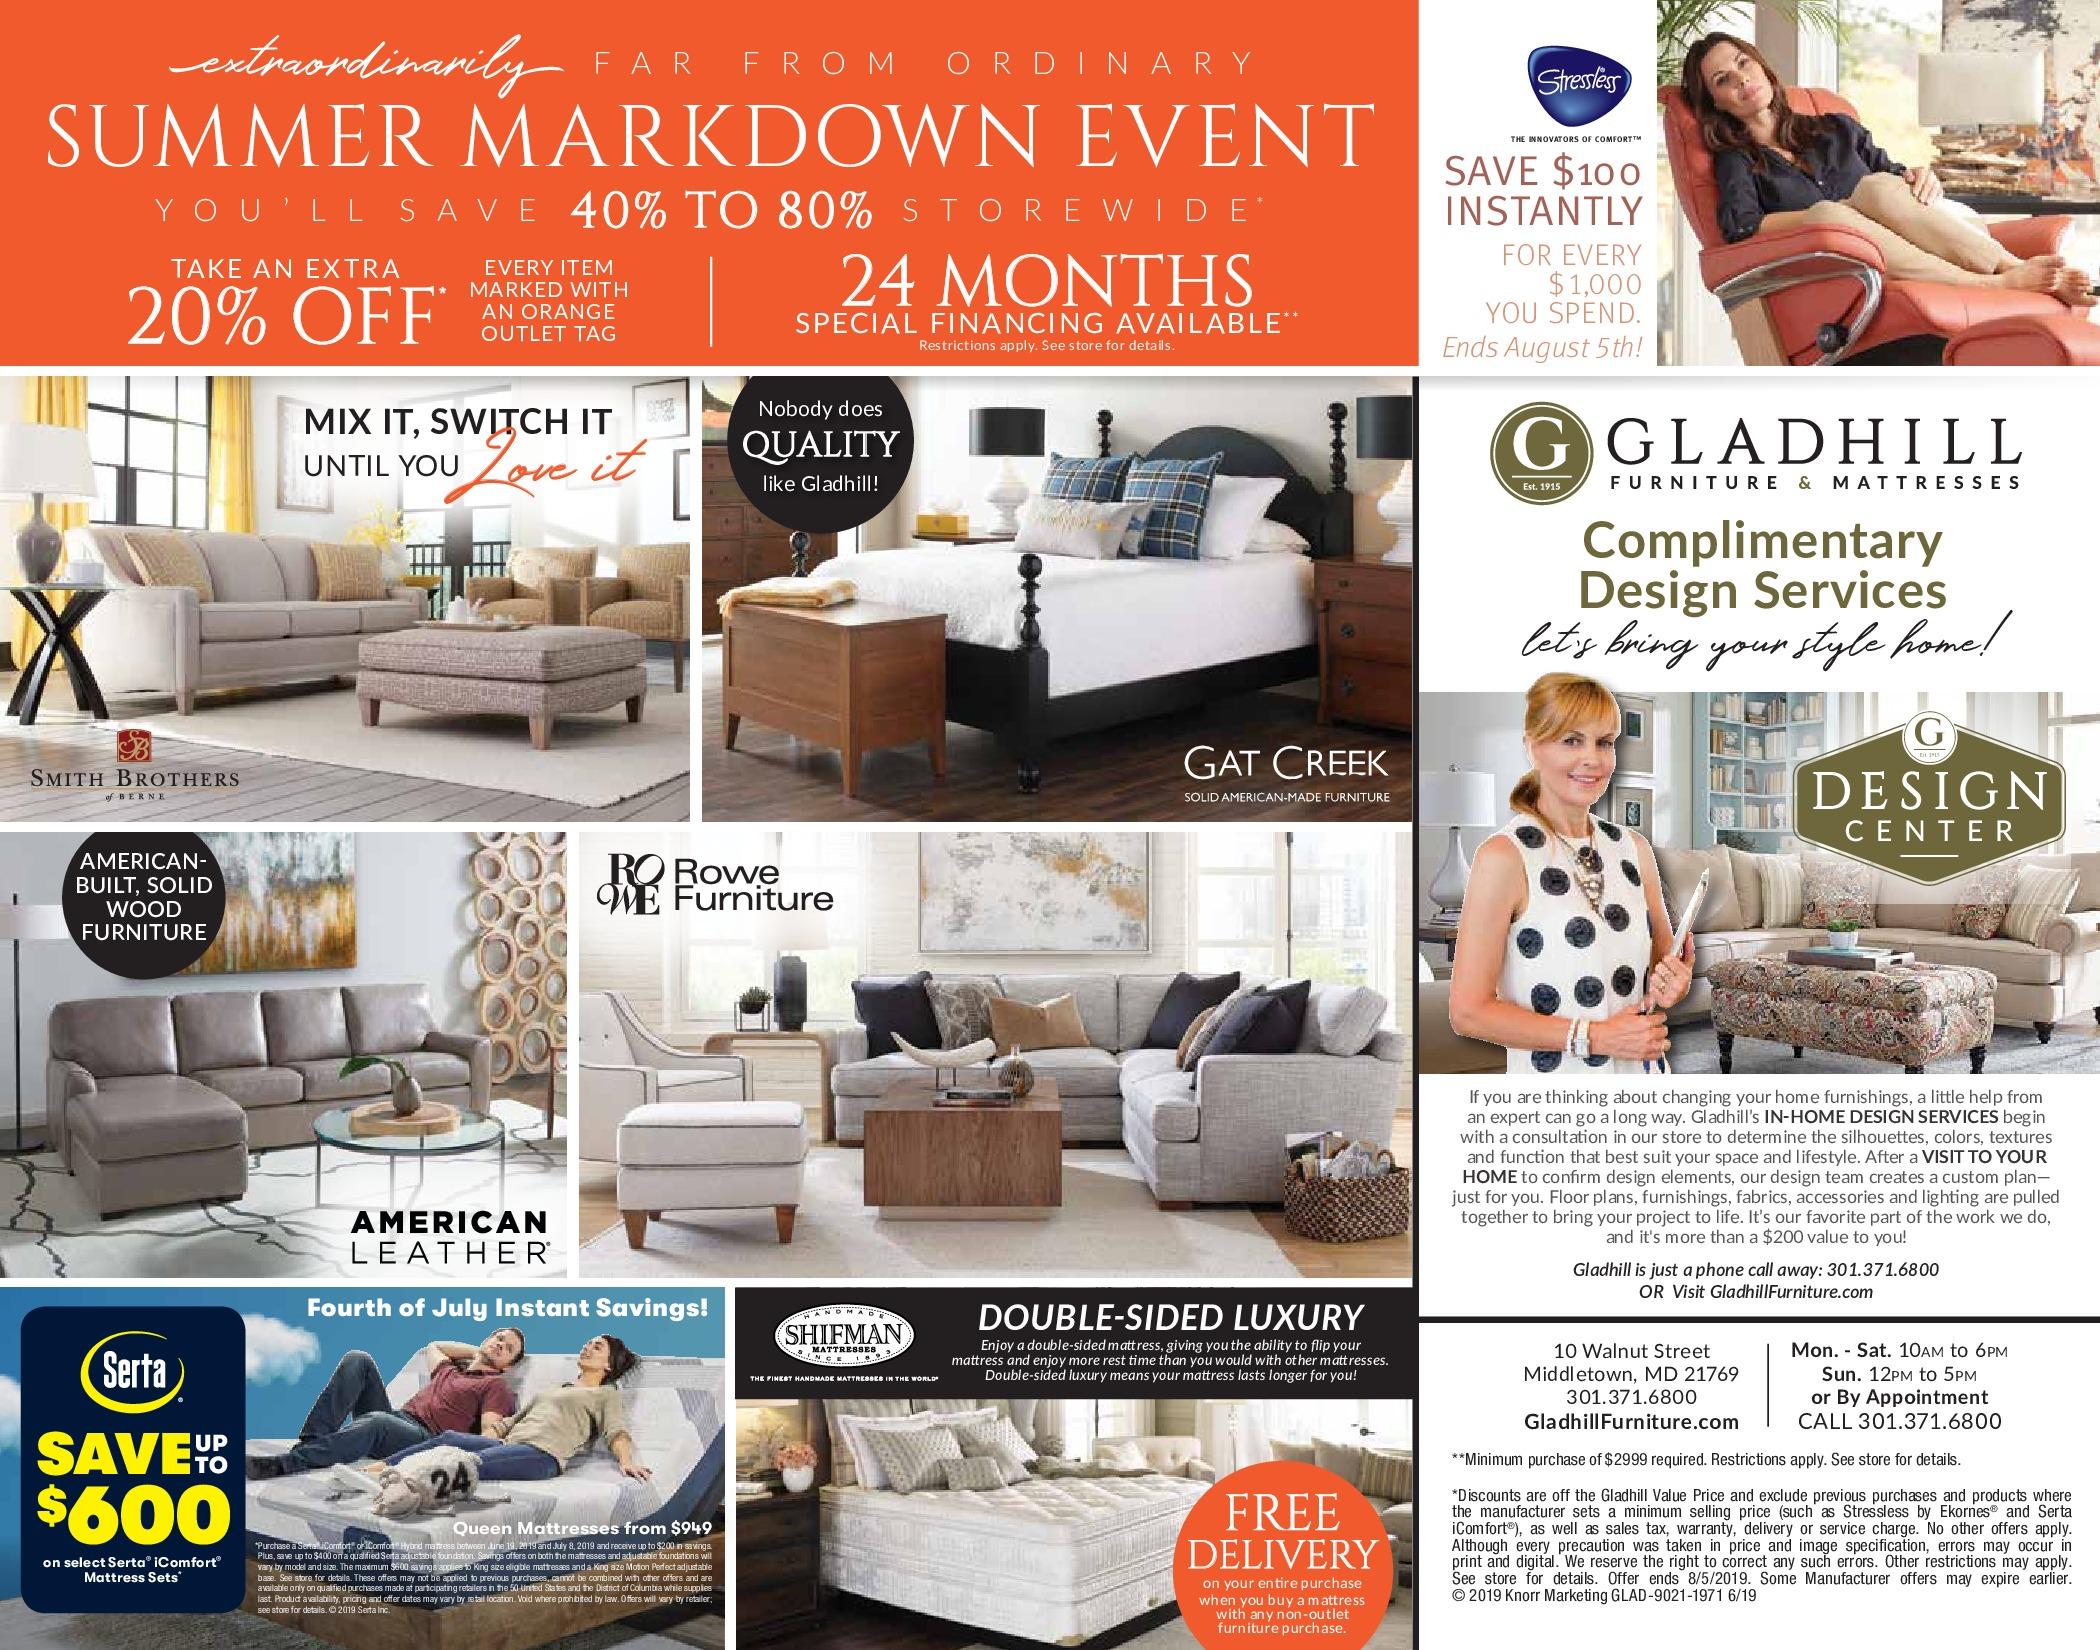 GLAD-9021-1971-SummerMarkdowns-Specials Page